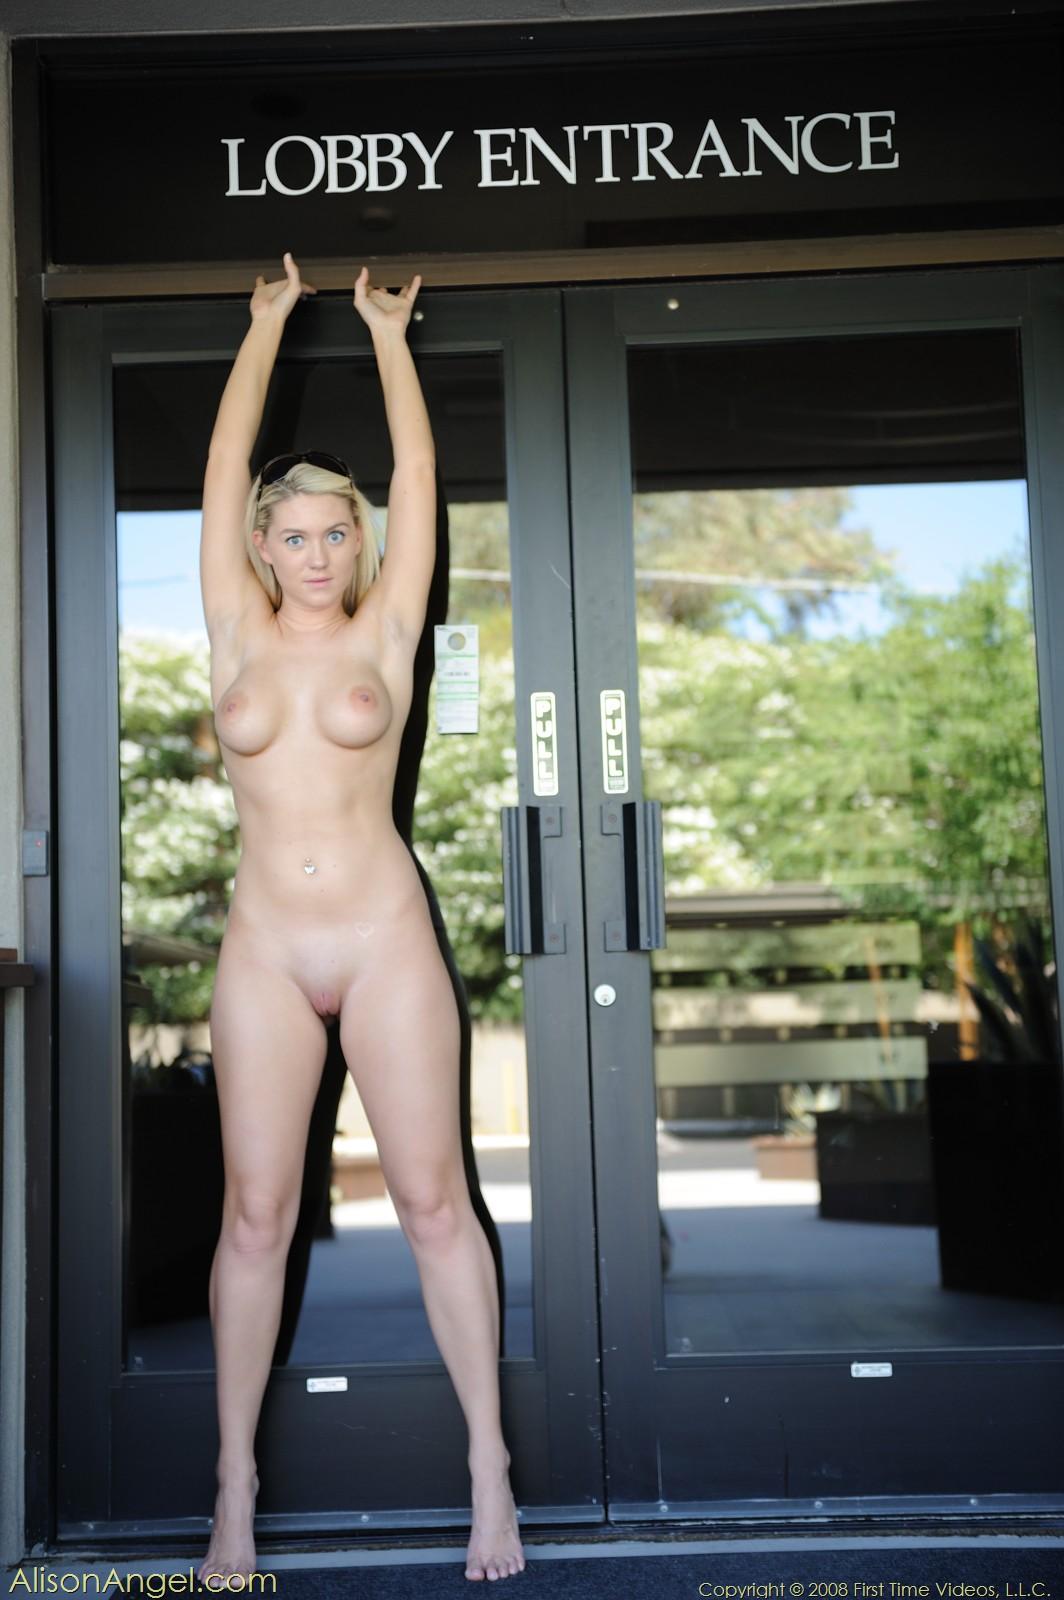 Alison angel public nudity videos — 14